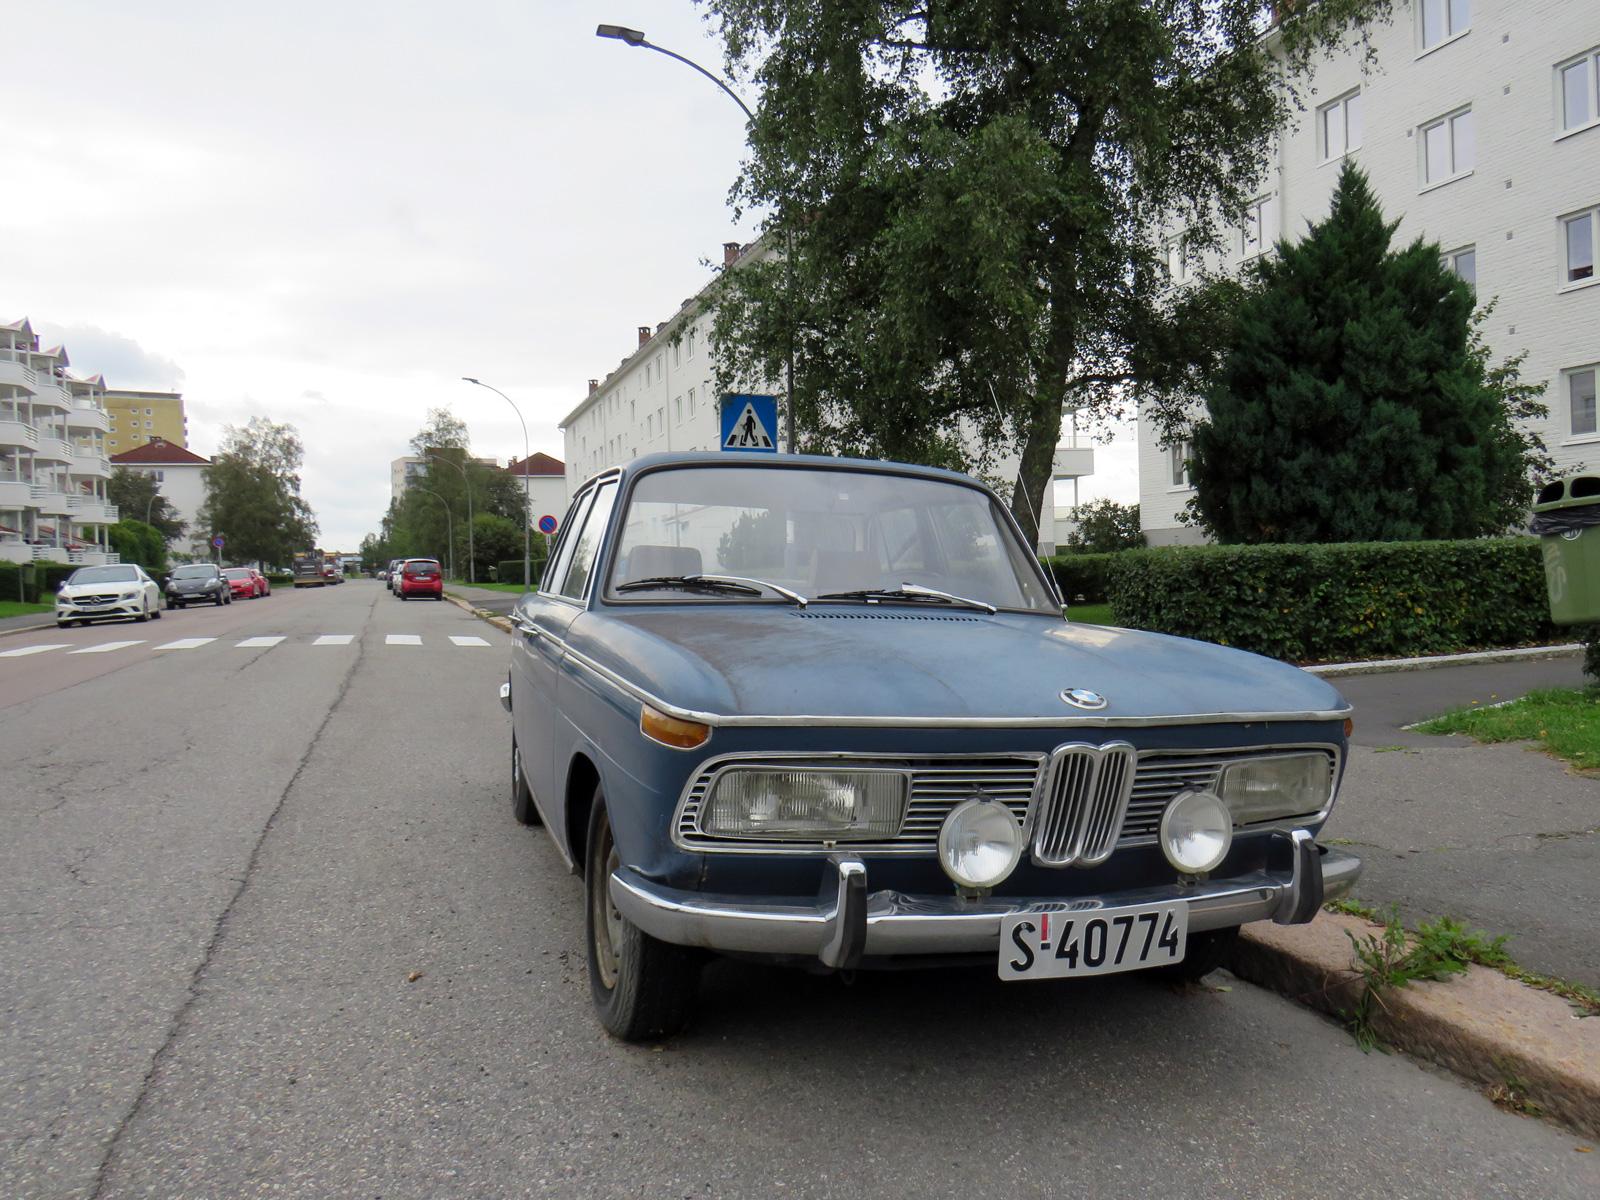 1970 Bmw 2000 New Class e10 Oslo classic cars